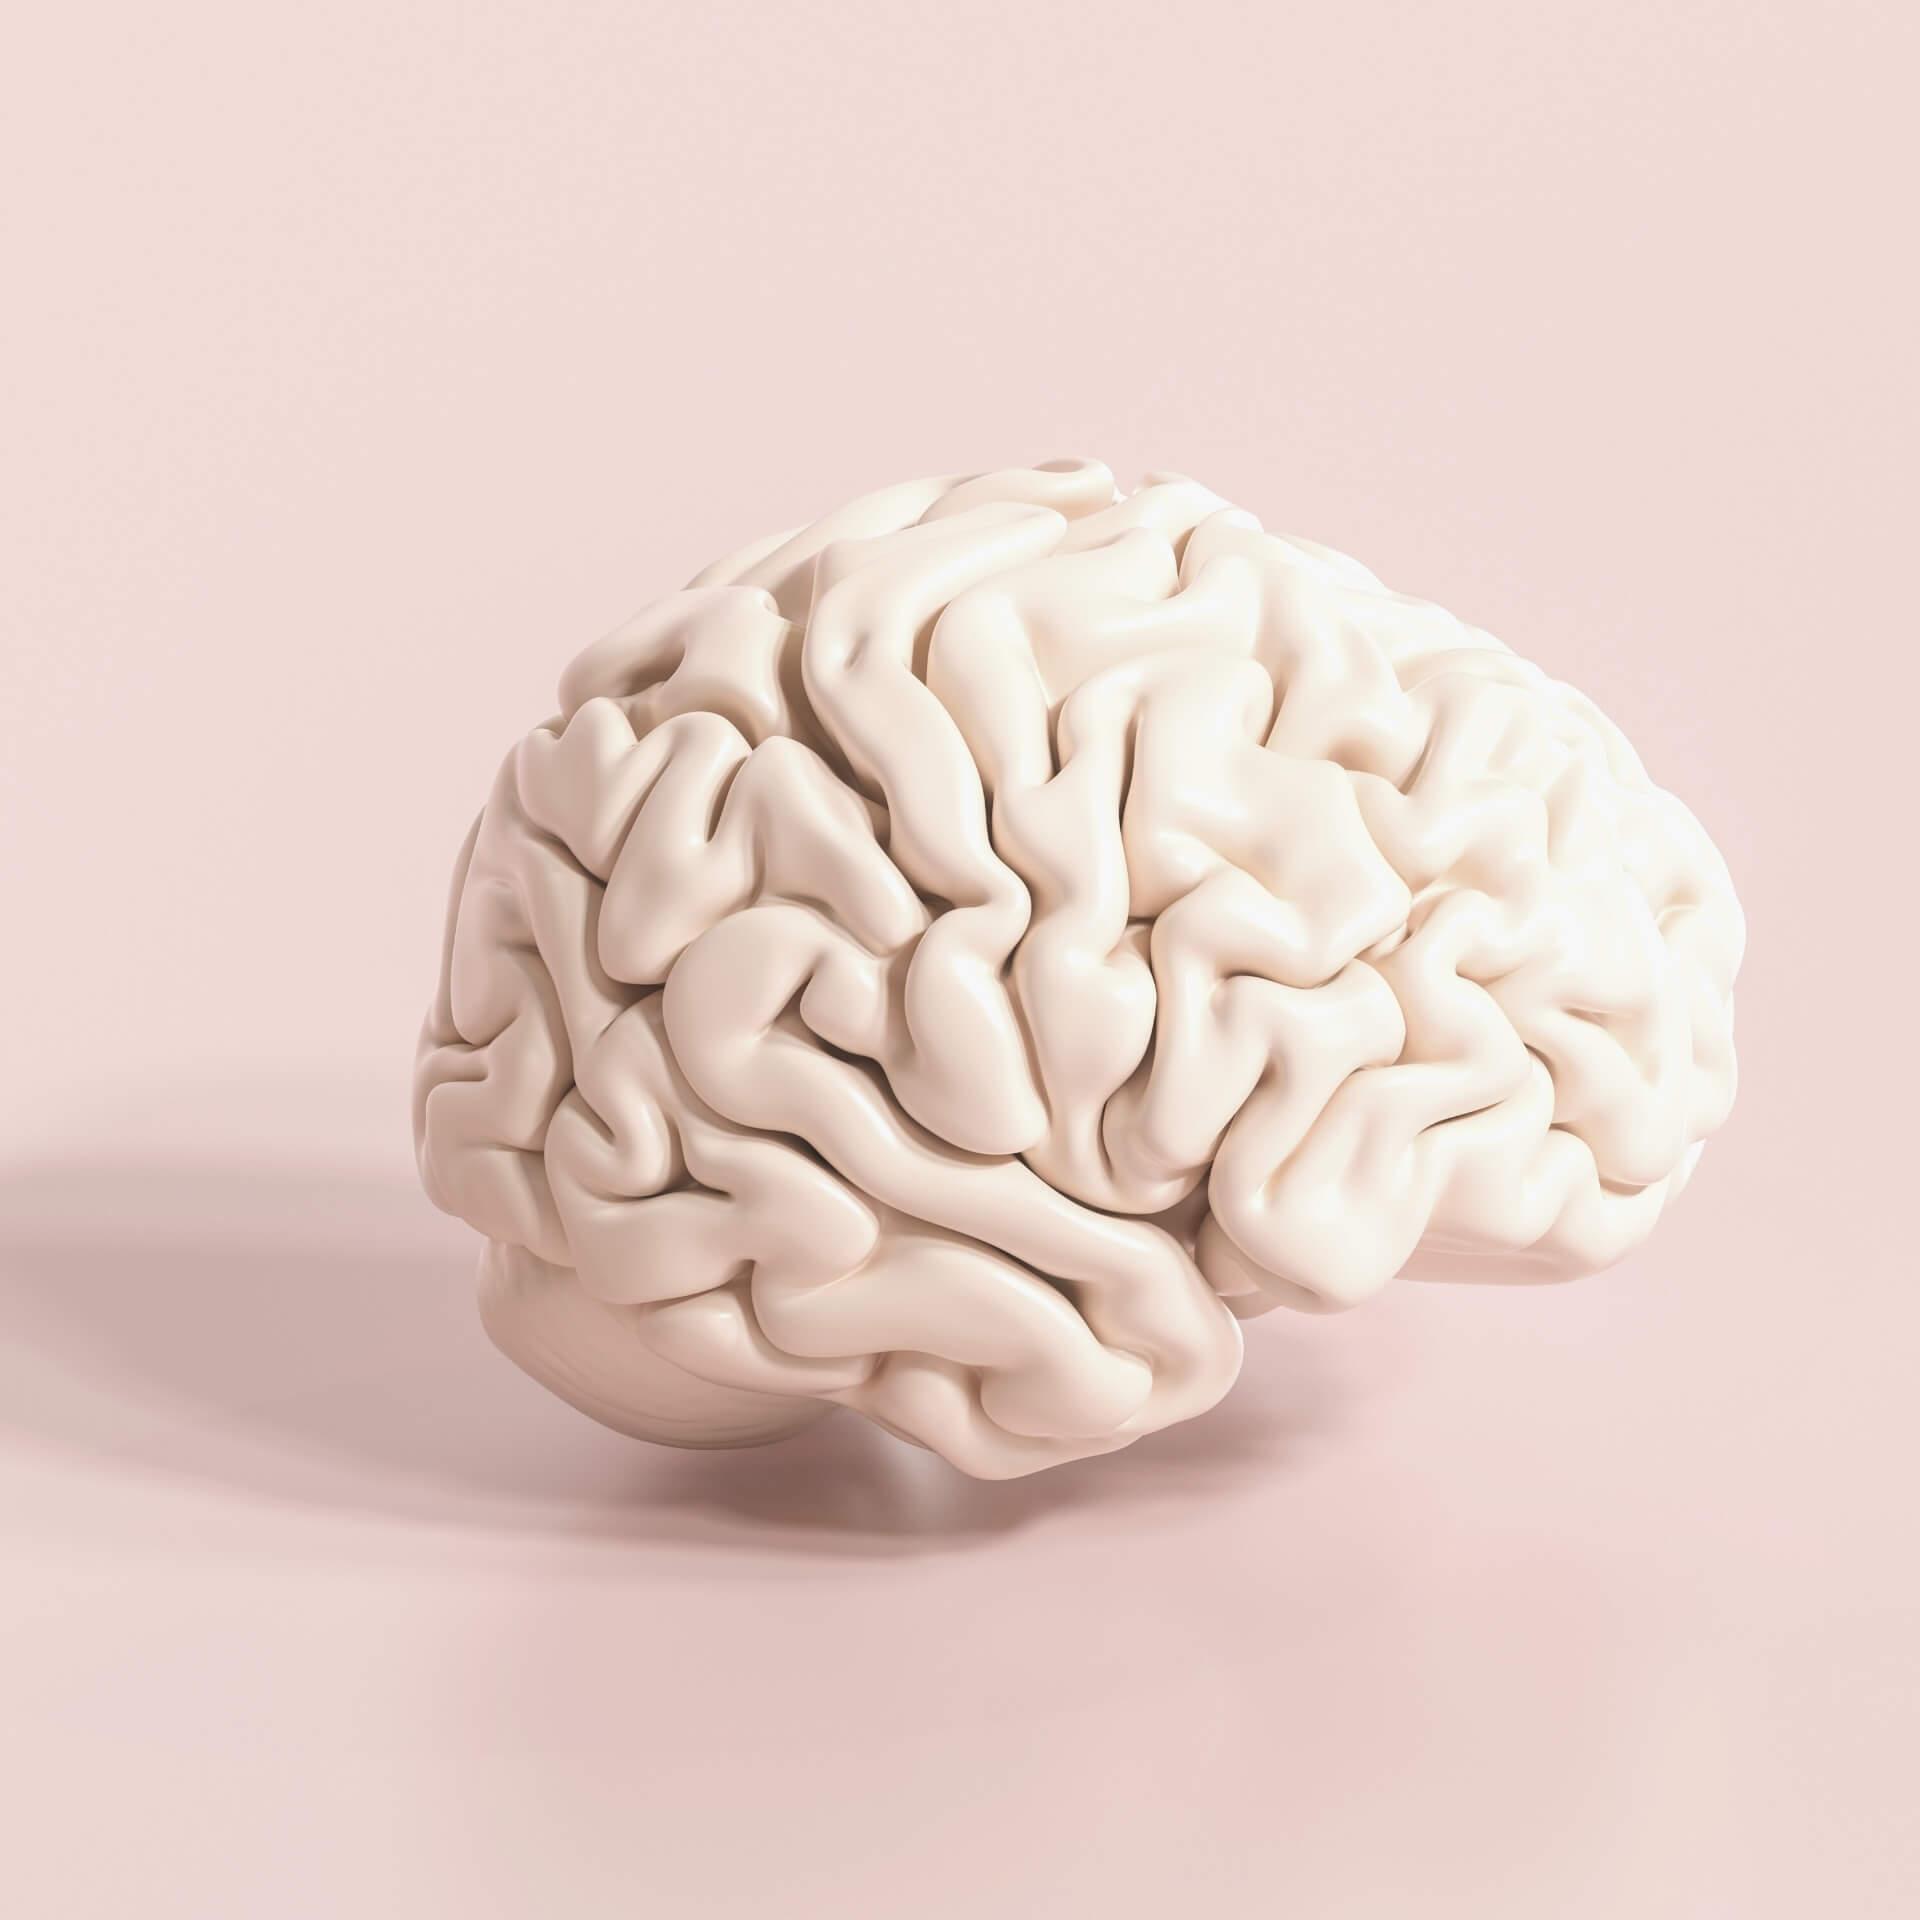 psychology of web design: A brain